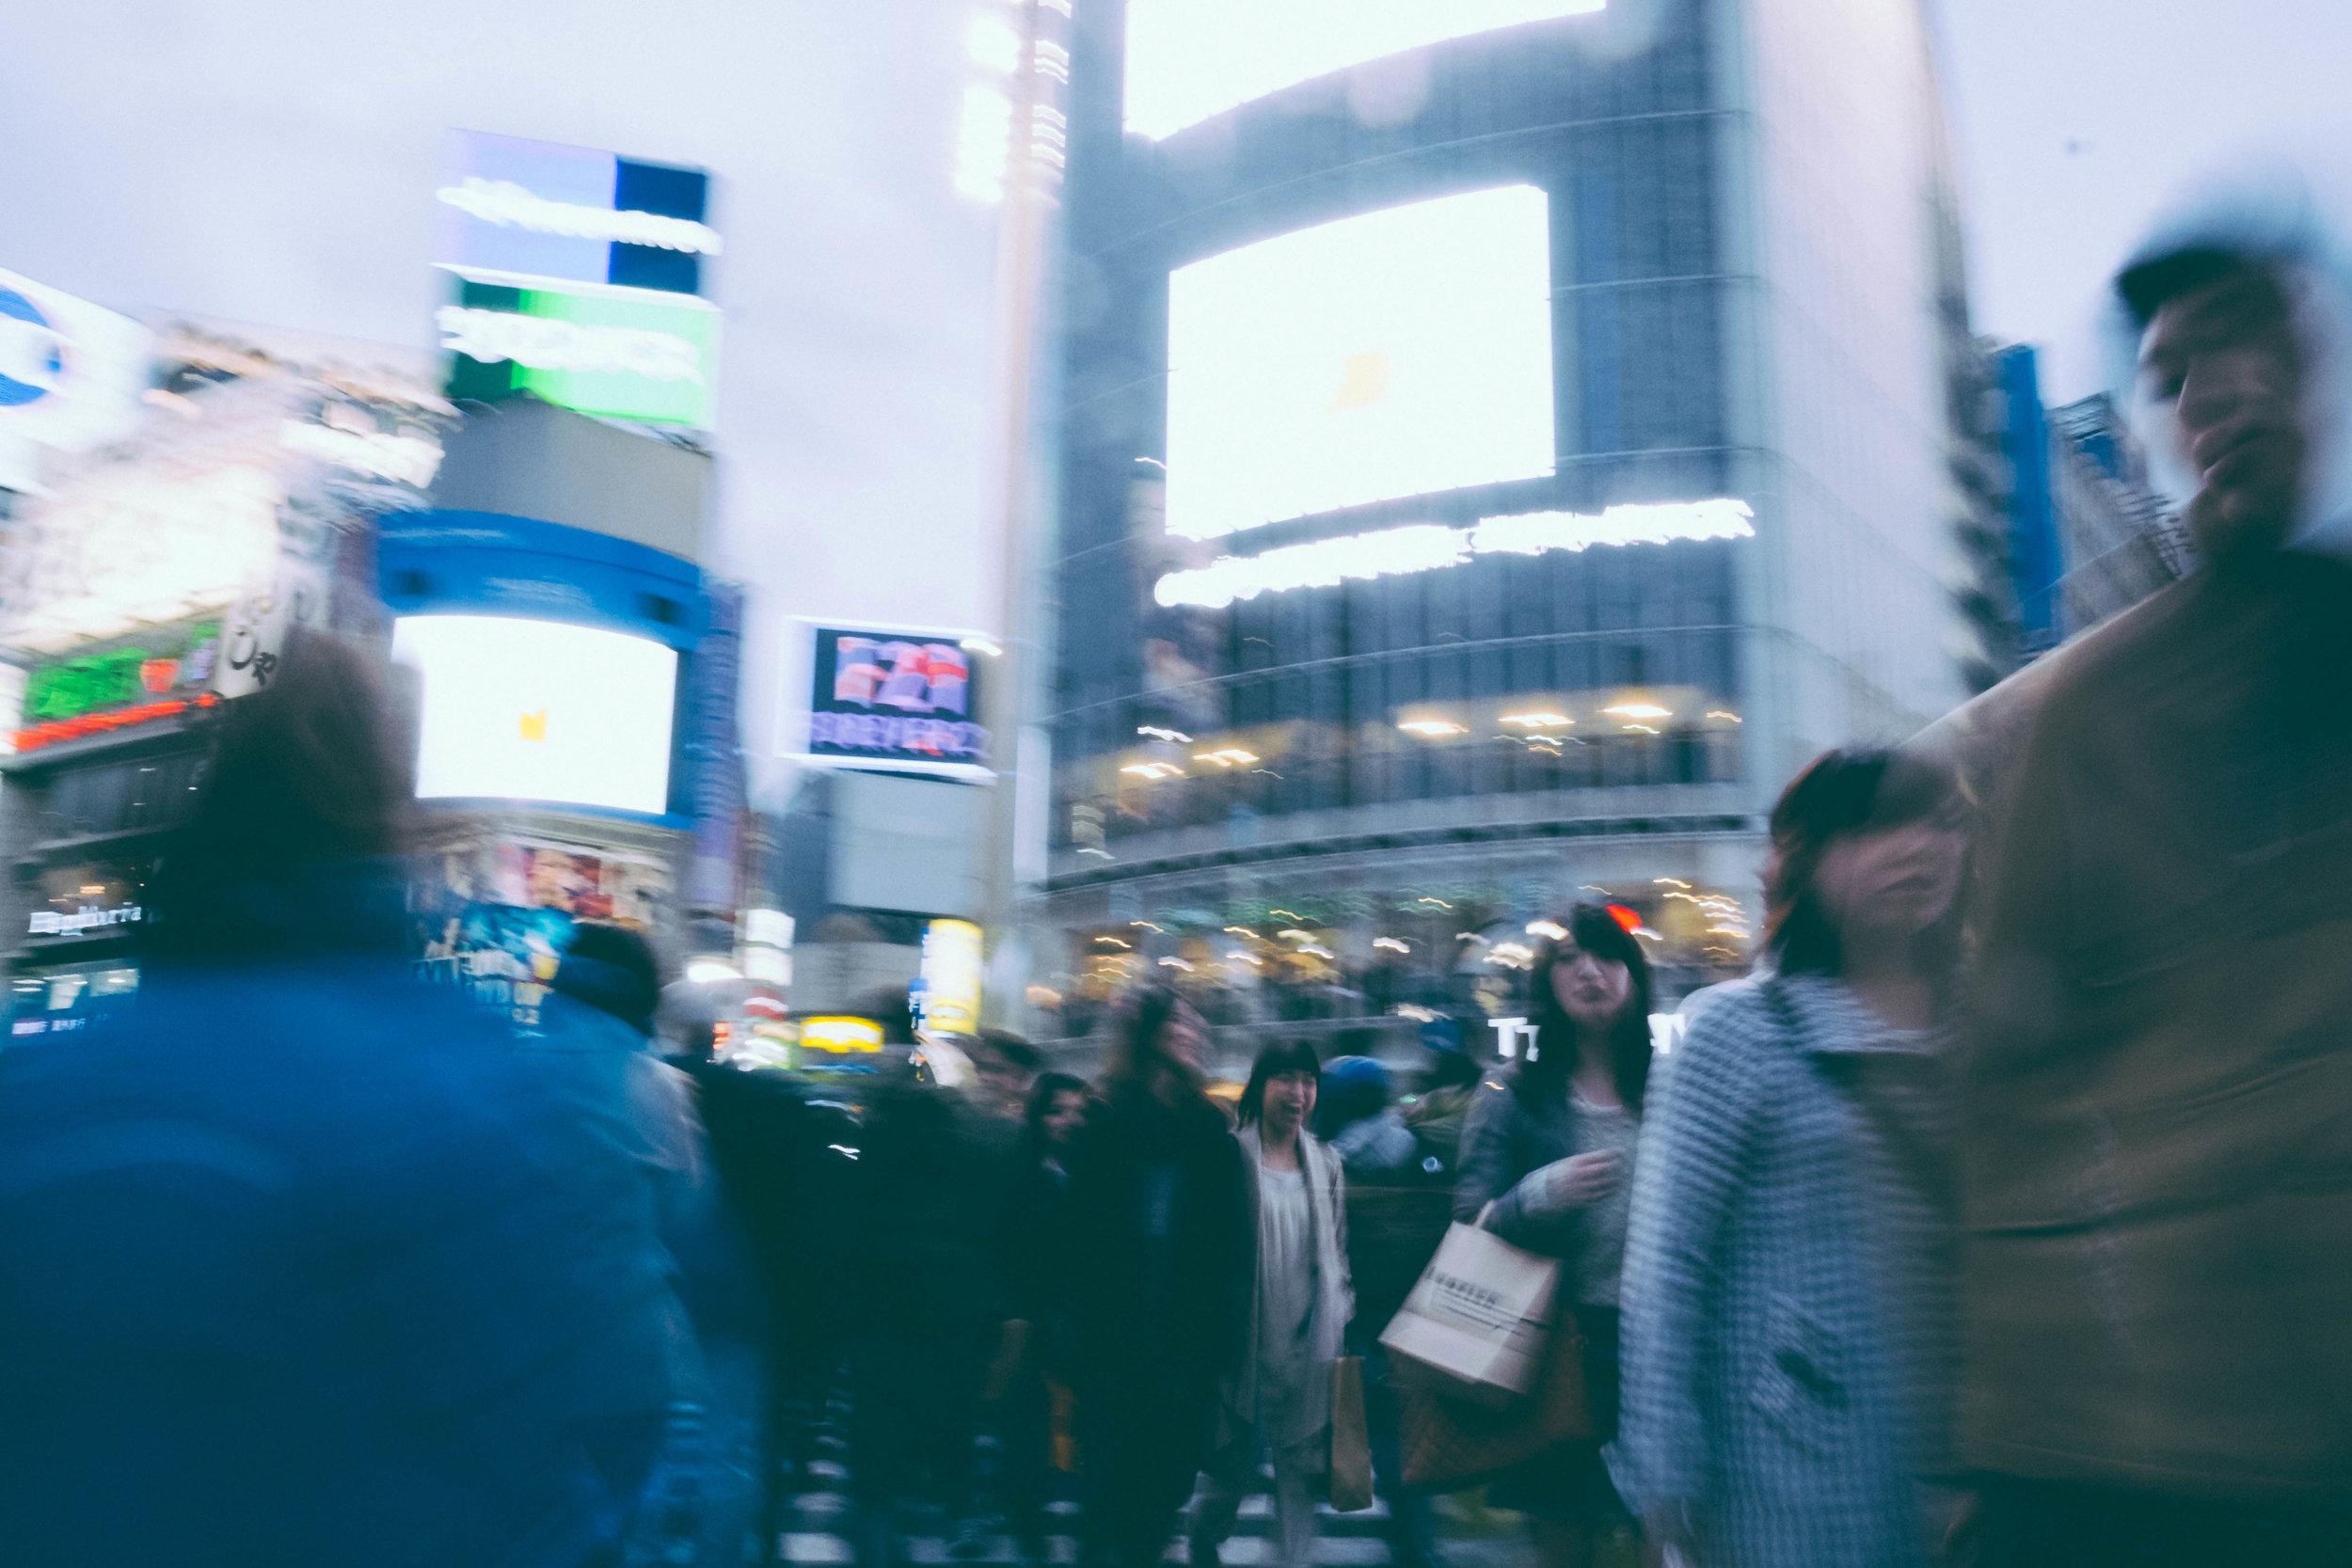 Organized chaos at Shibuya crosswalk, Tokyo.